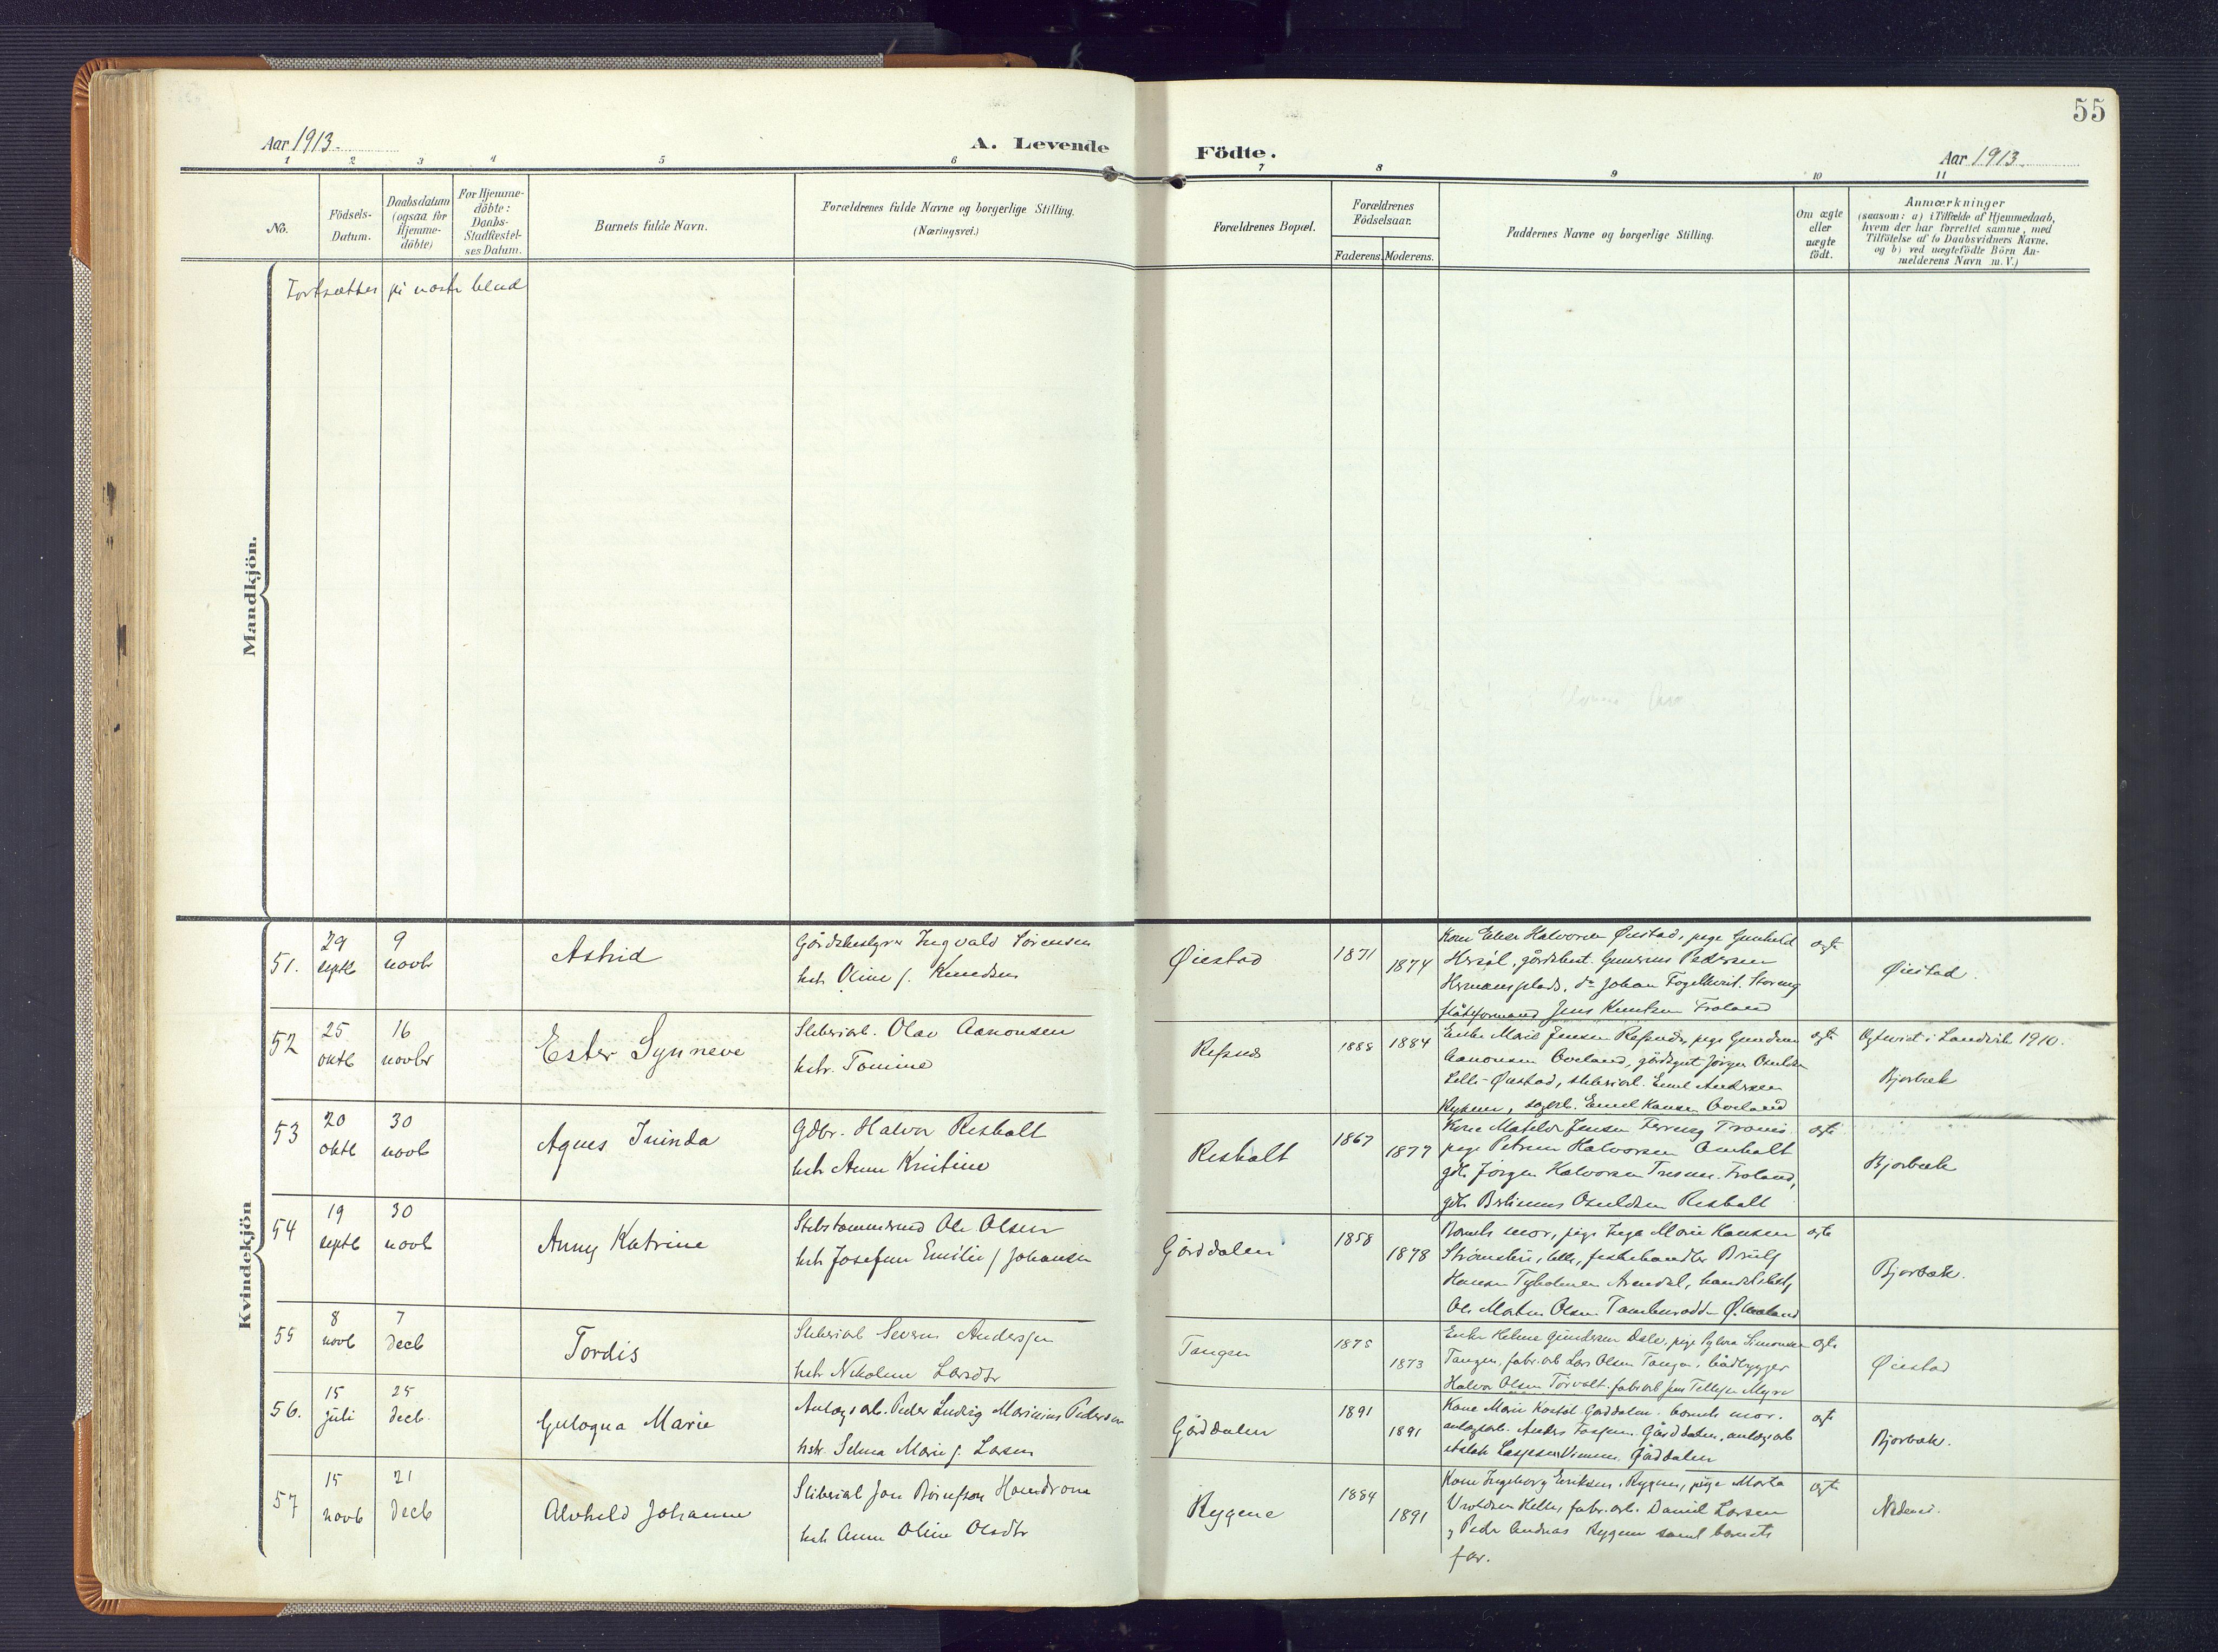 SAK, Øyestad sokneprestkontor, F/Fa/L0019: Ministerialbok nr. A 19, 1908-1922, s. 55